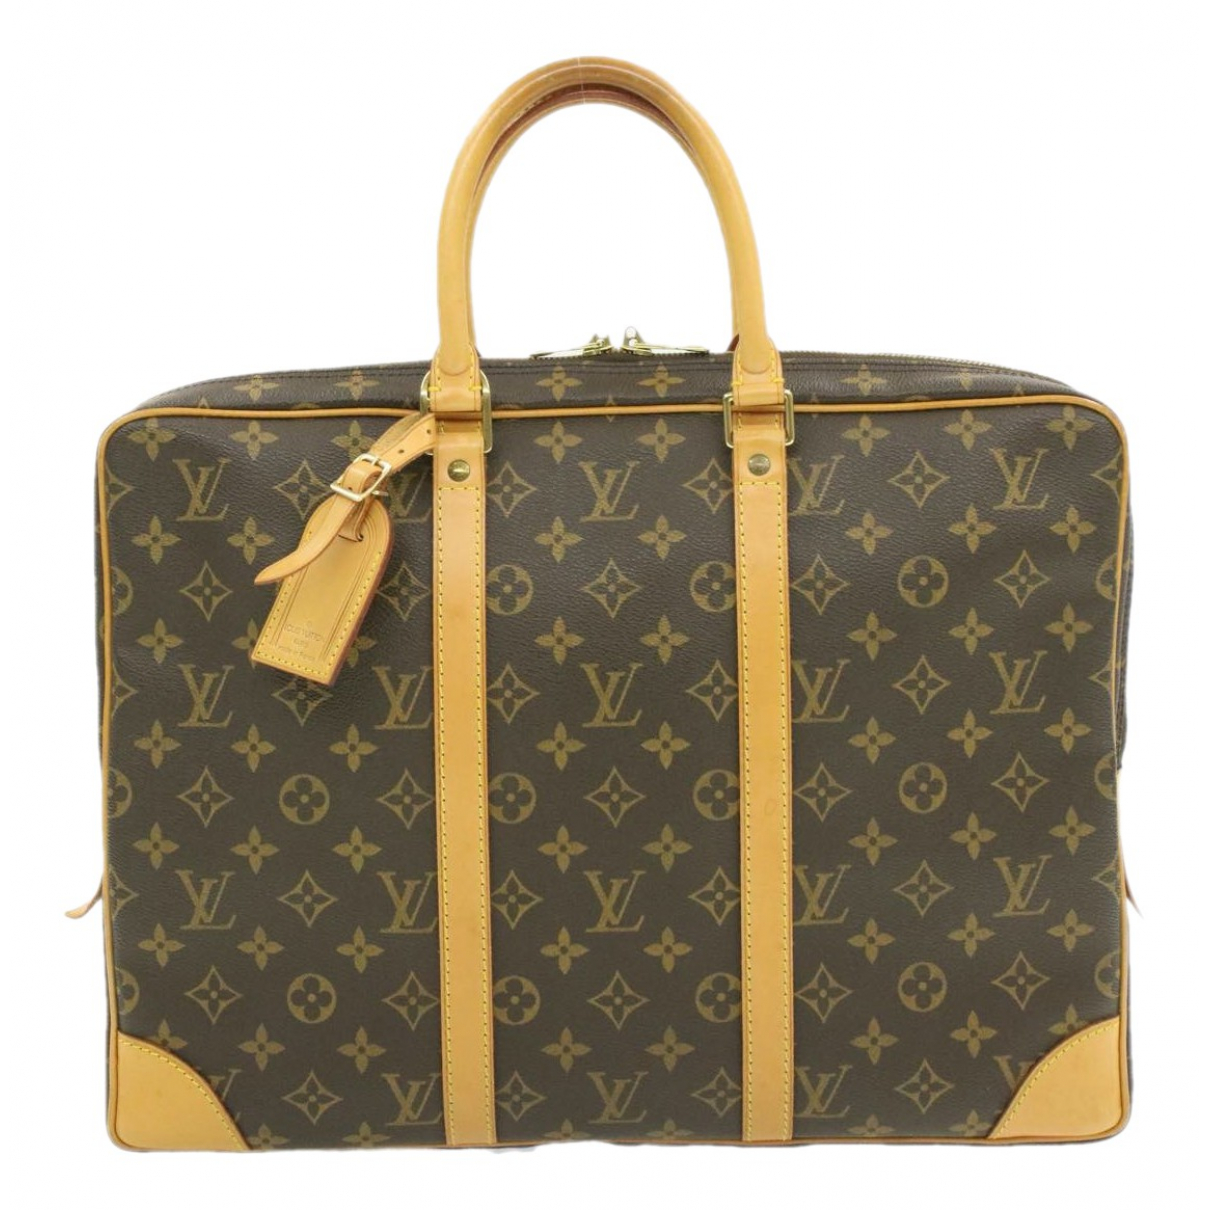 Louis Vuitton Porte Documents Voyage Brown Cloth handbag for Women N